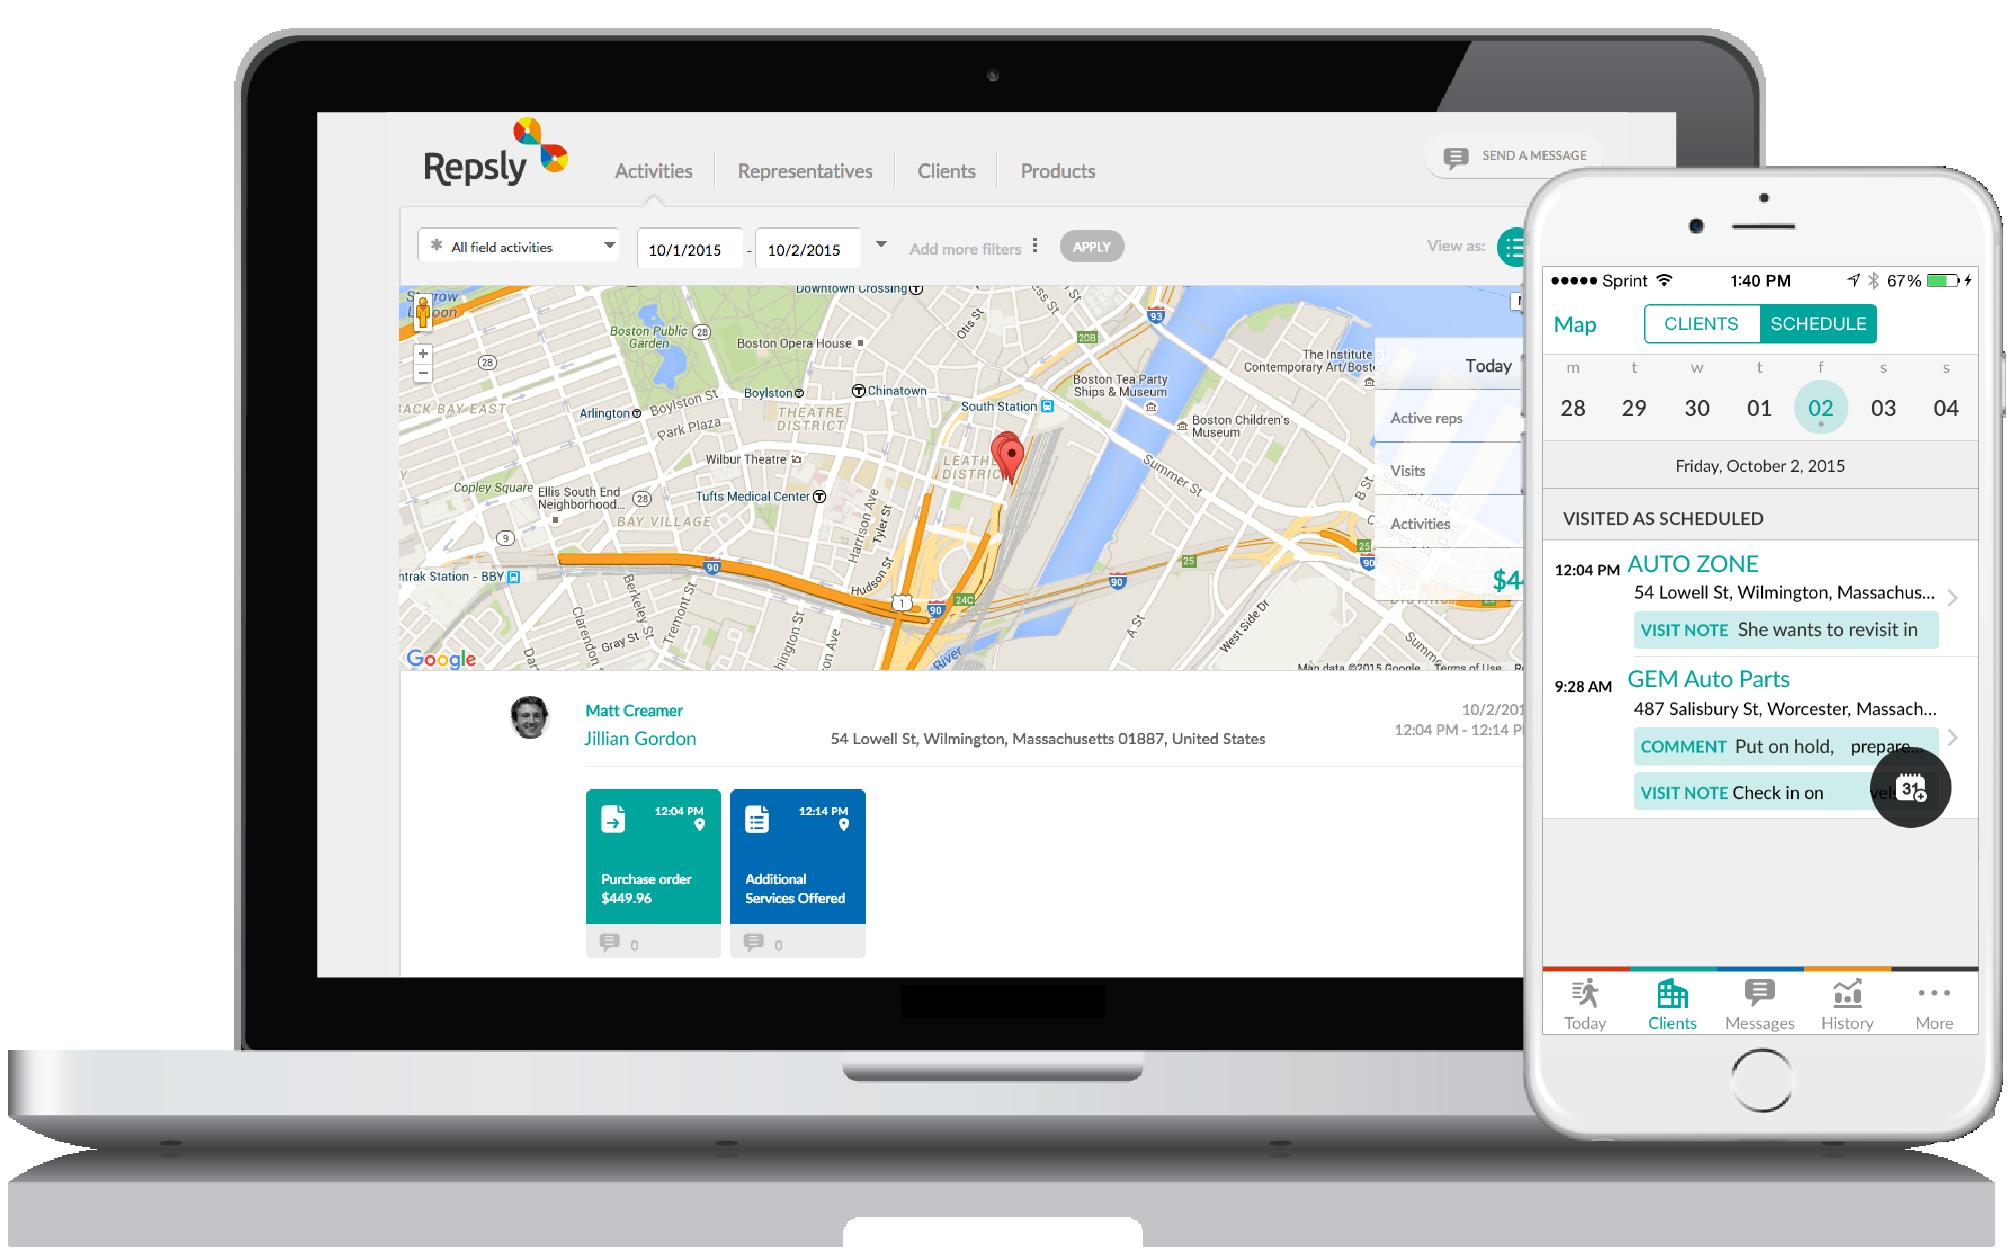 Auto Parts App GPS Tracking